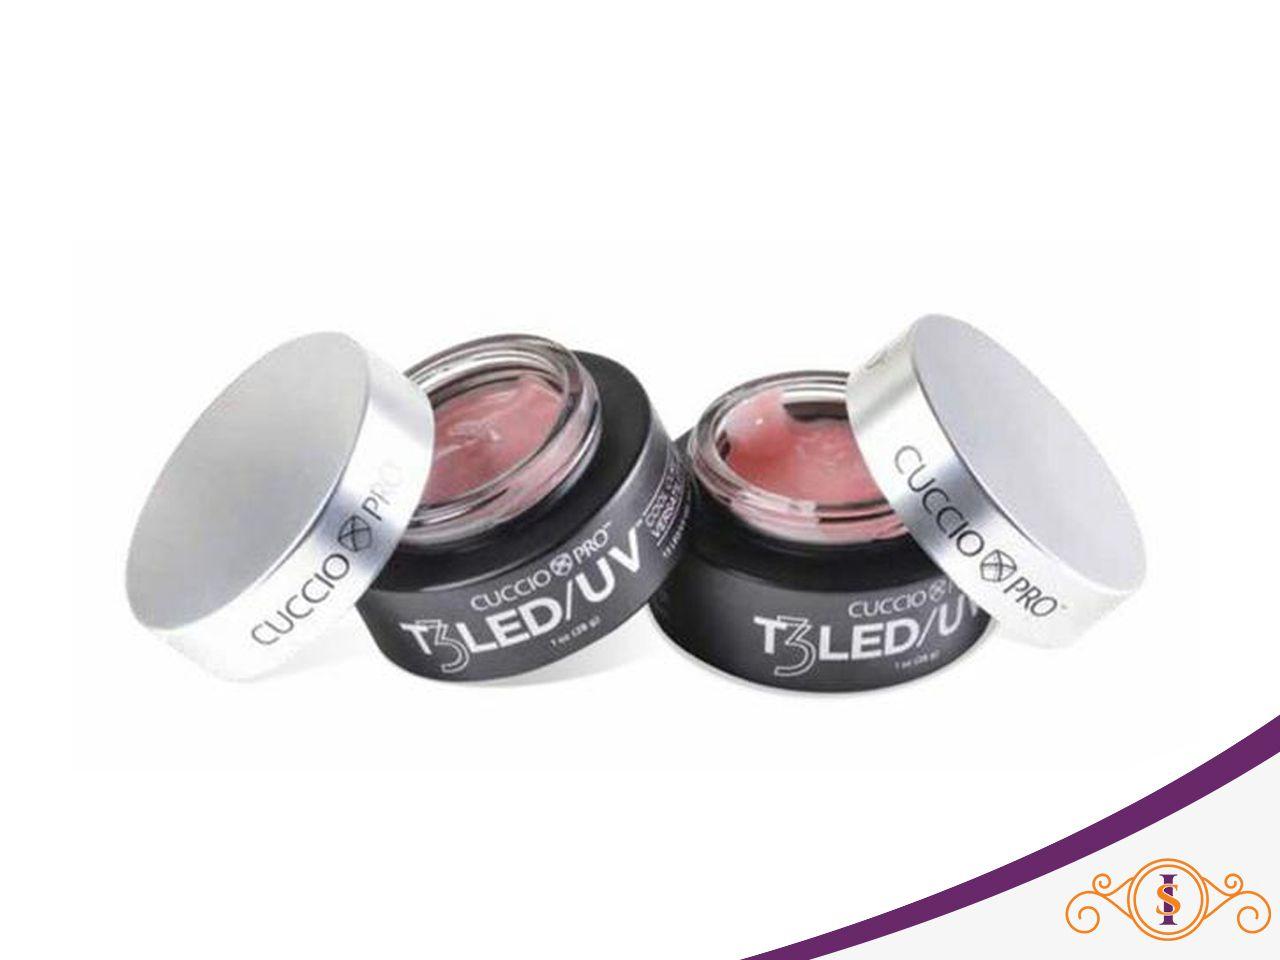 Gel - T3 Controlled Led/Uv - Pink - 28g